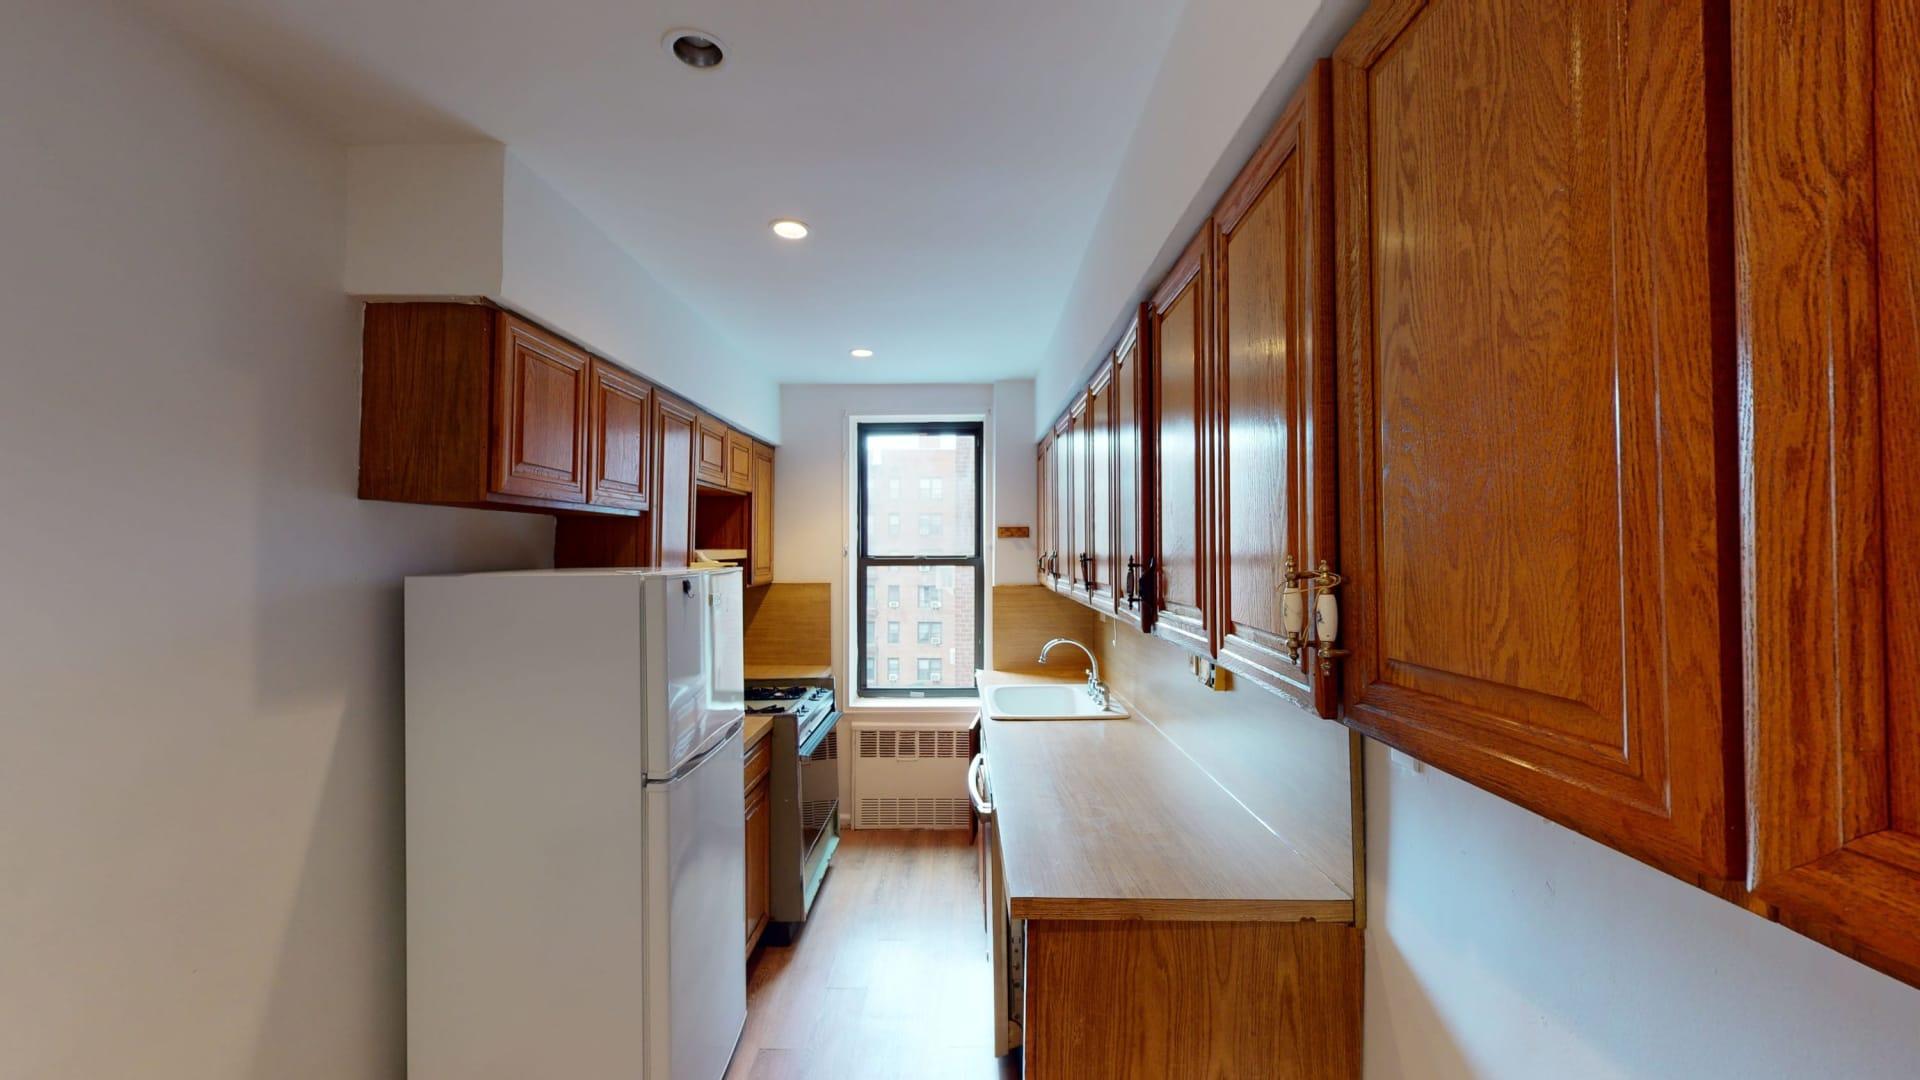 33-46 92nd Street Unit 4S photo